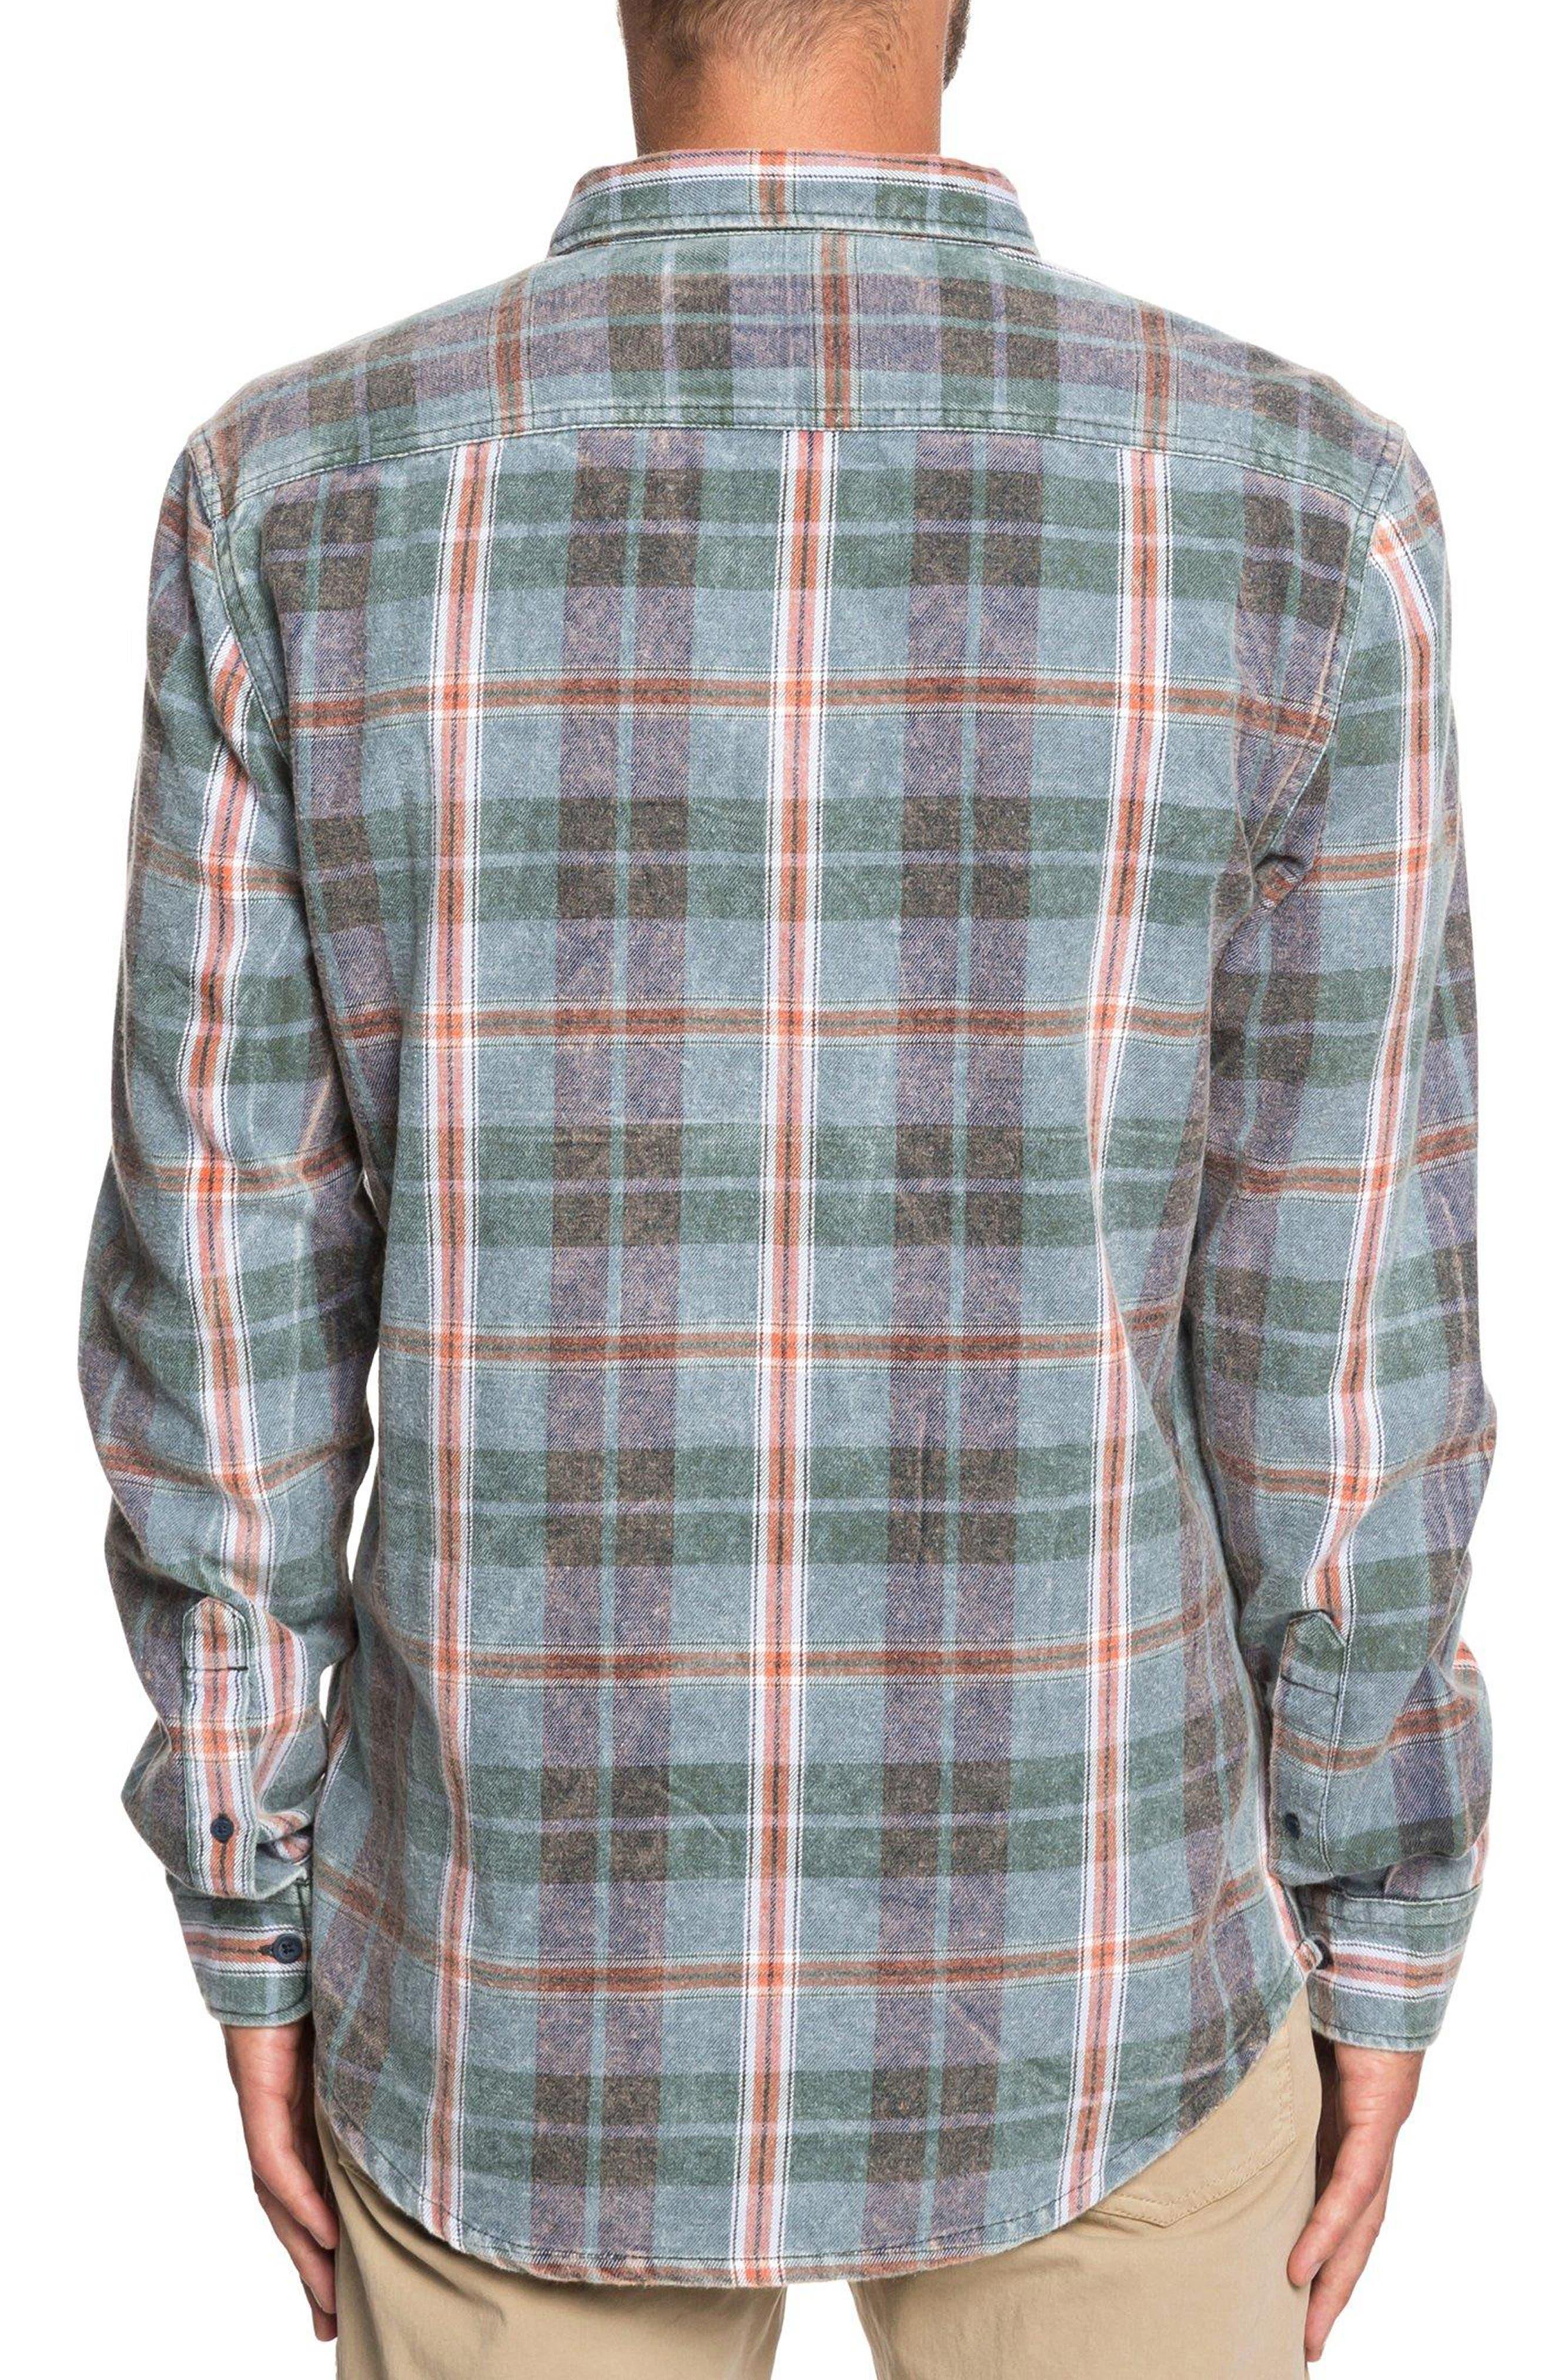 Super Tang Flannel Shirt,                             Alternate thumbnail 3, color,                             STONE WASH TANG